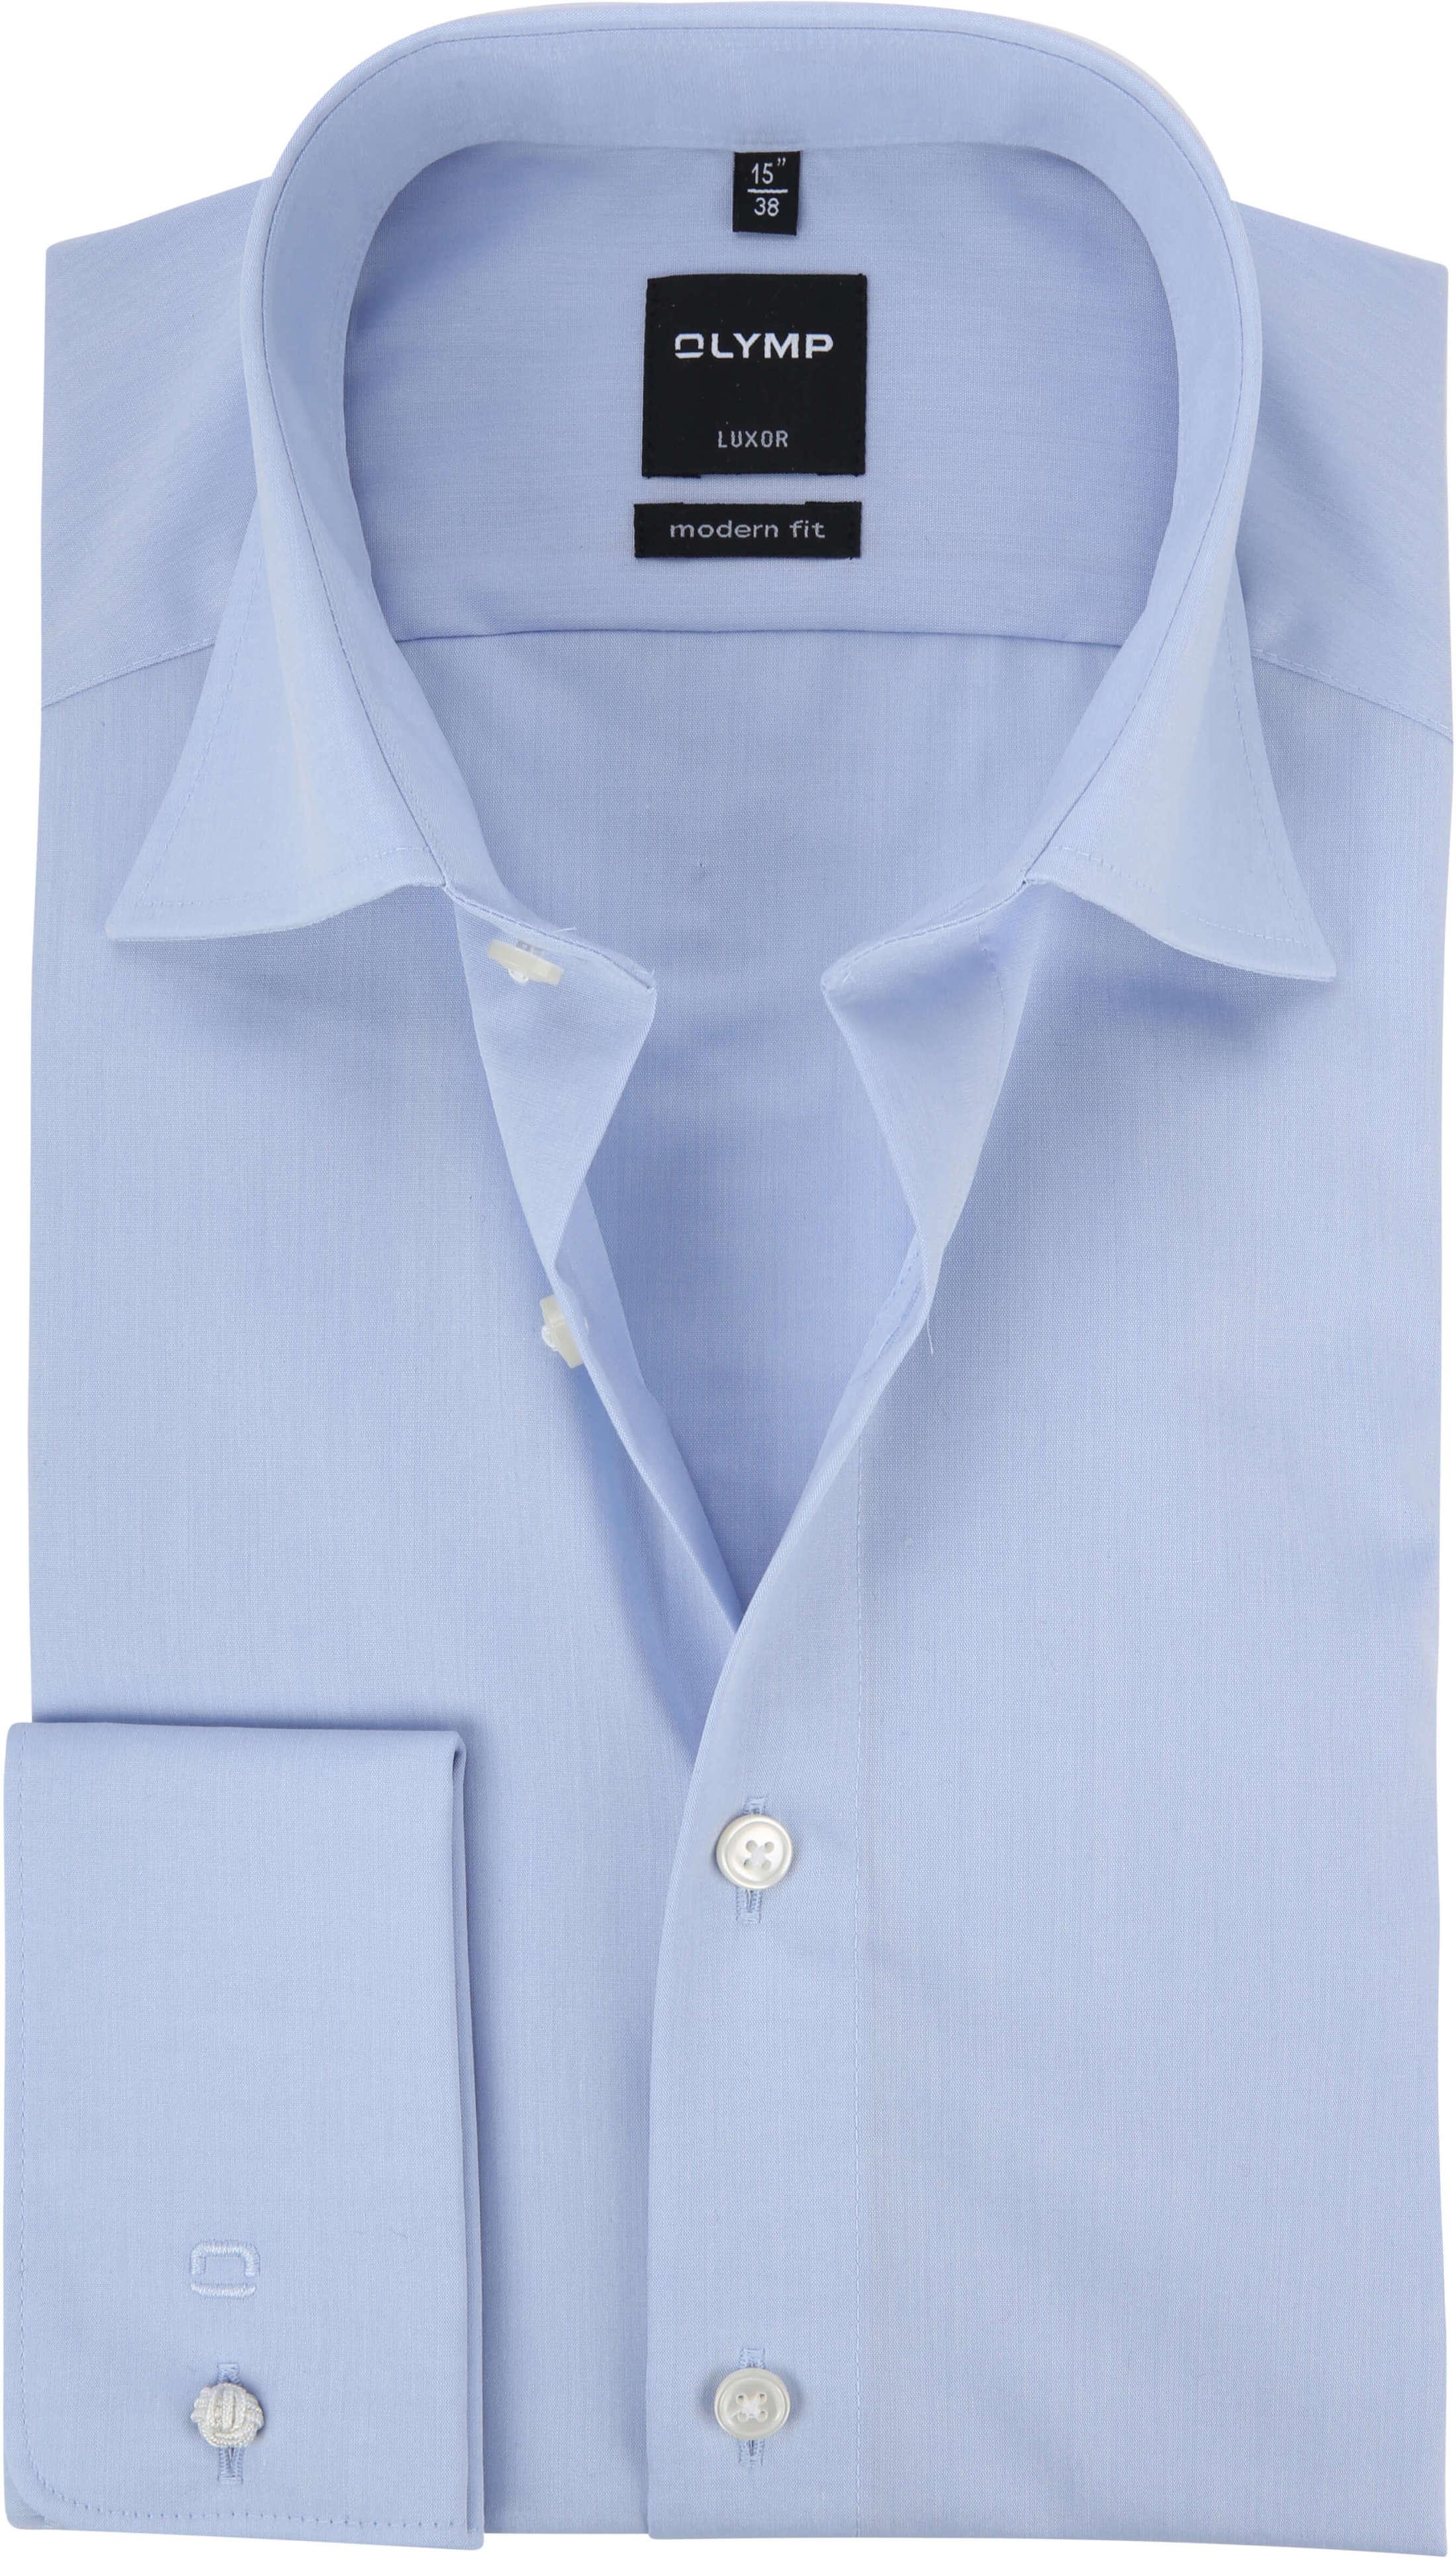 OLYMP Luxor Hemd Modern Fit Doppelmanschette Blau foto 0